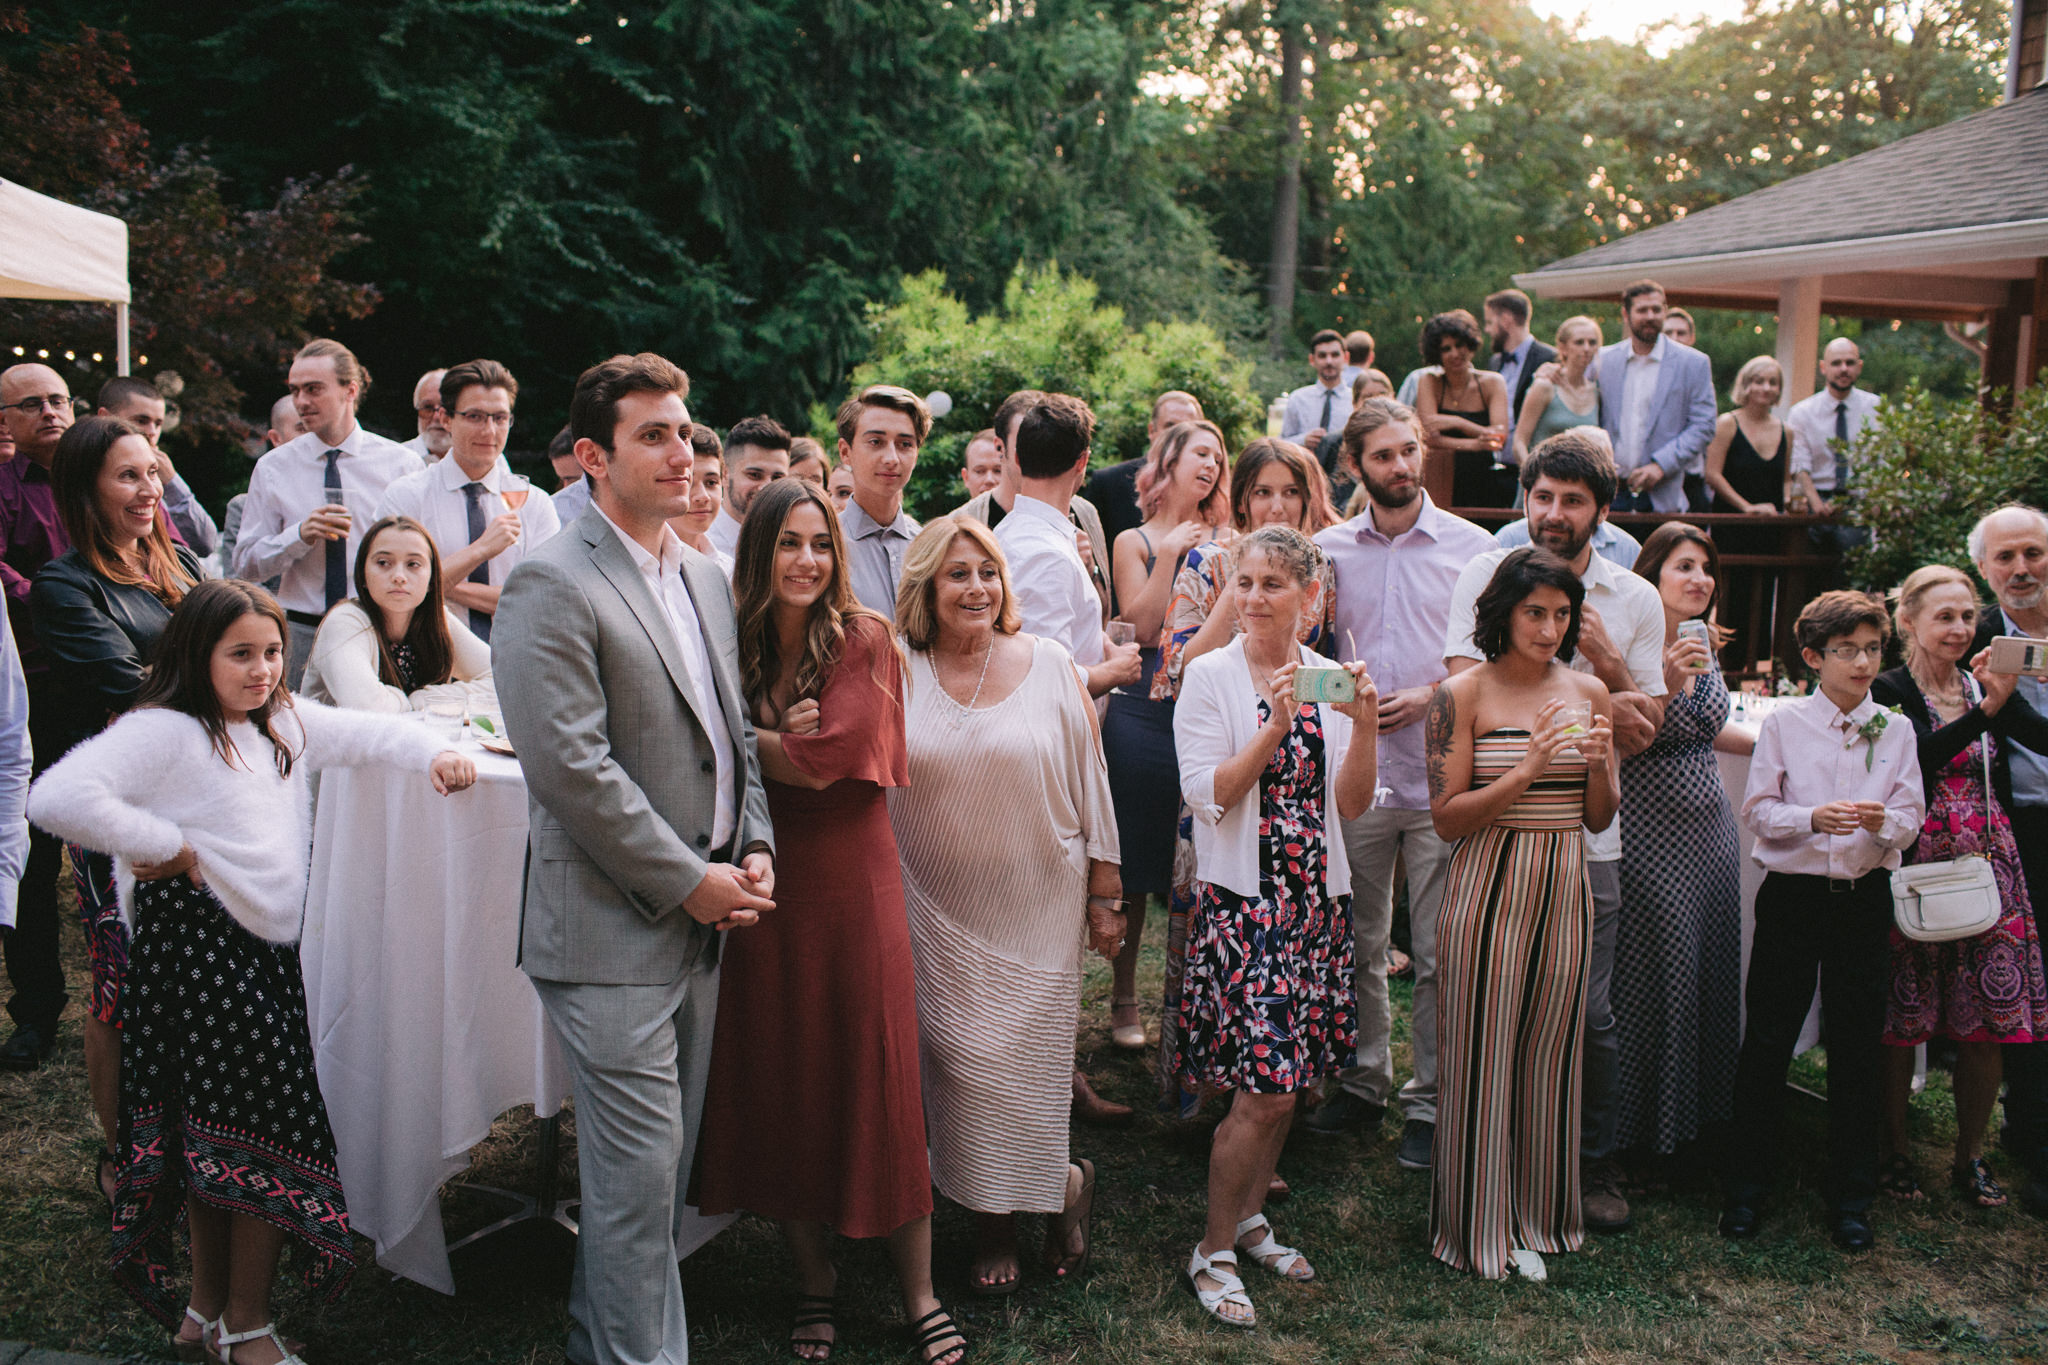 Backyard-Bainbridge-Island-Wedding-Alycia-Lovell-Photography-184.JPG